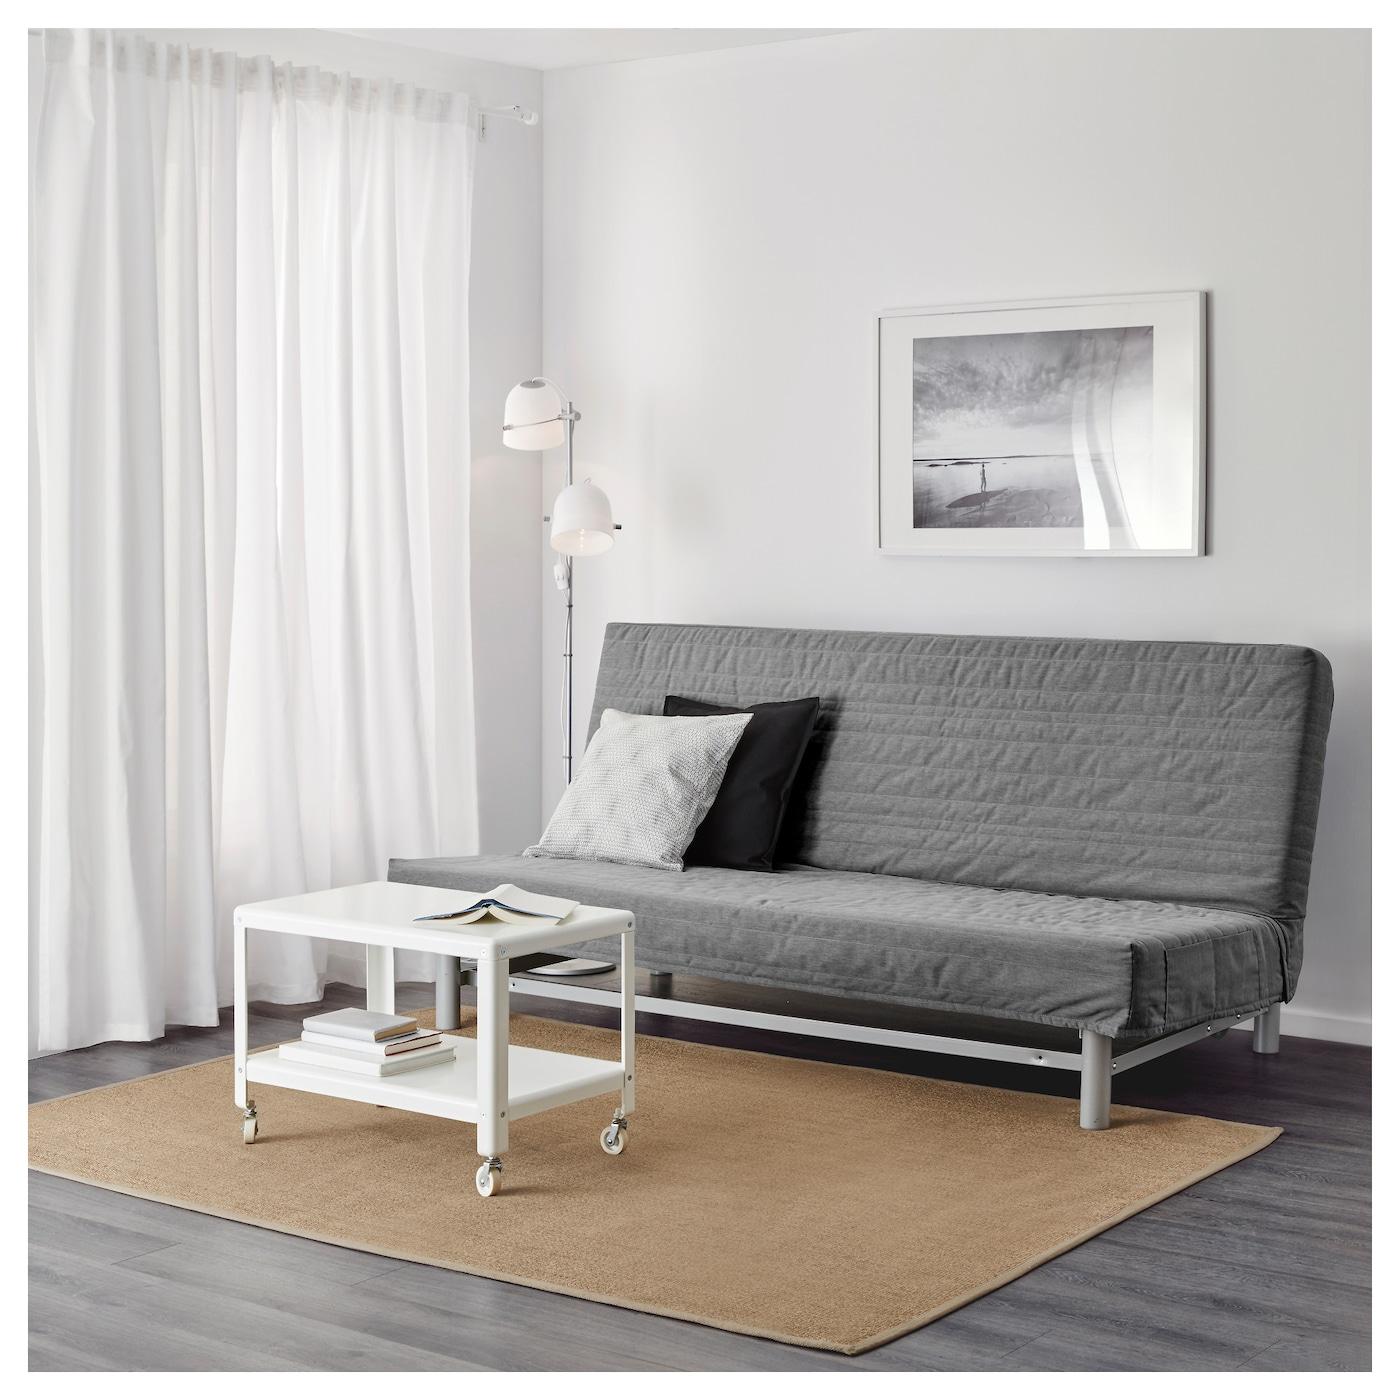 BEDDINGE LVS Threeseat sofabed Knisa light grey IKEA